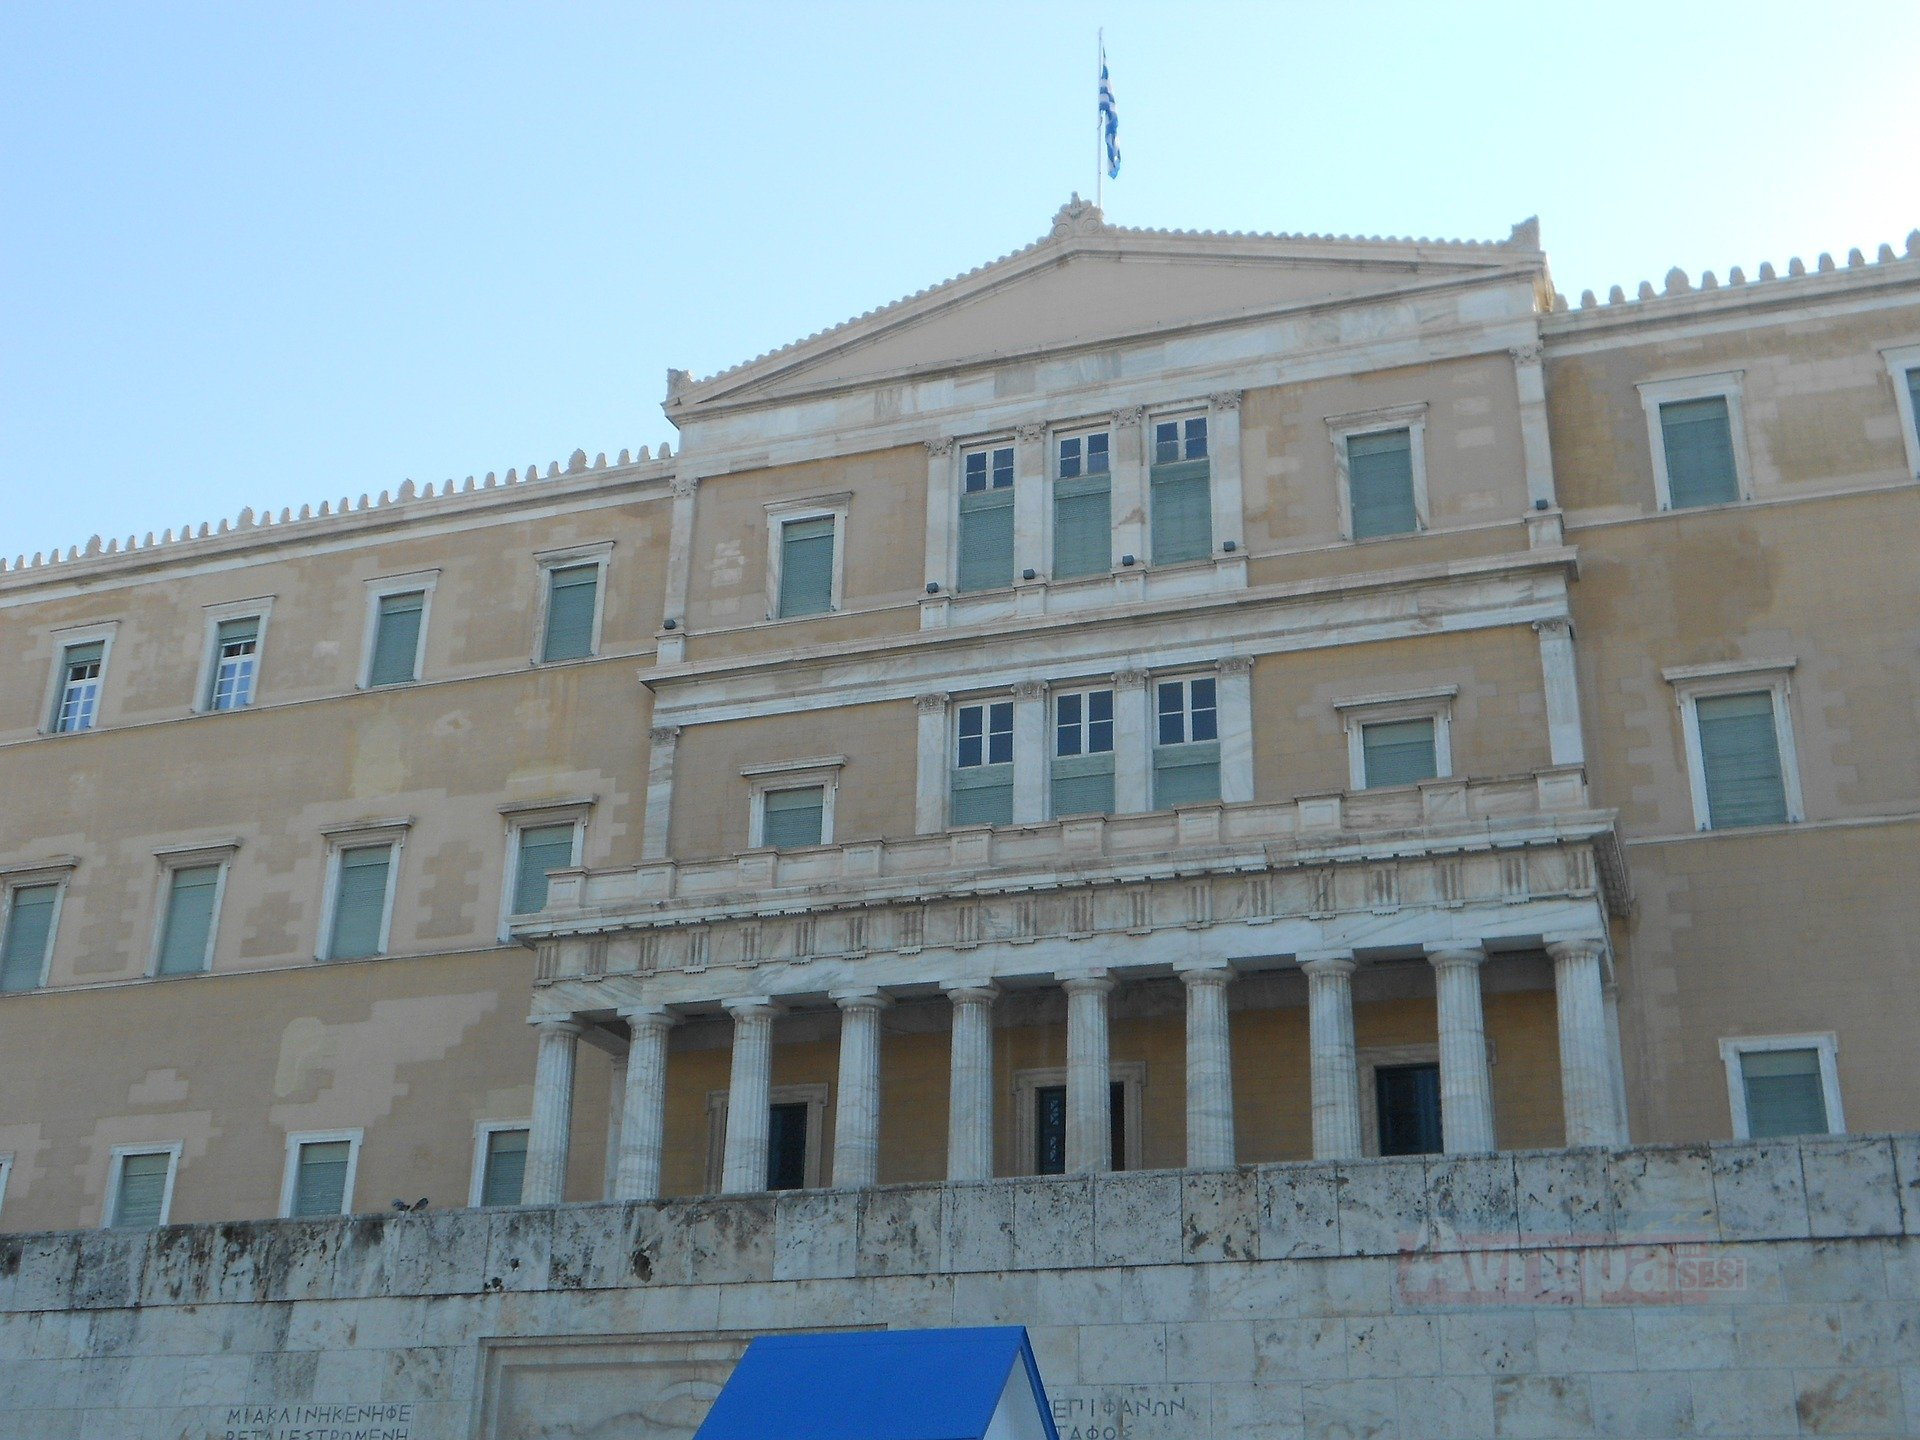 Yunanistan Türkiye'yi protesto etti